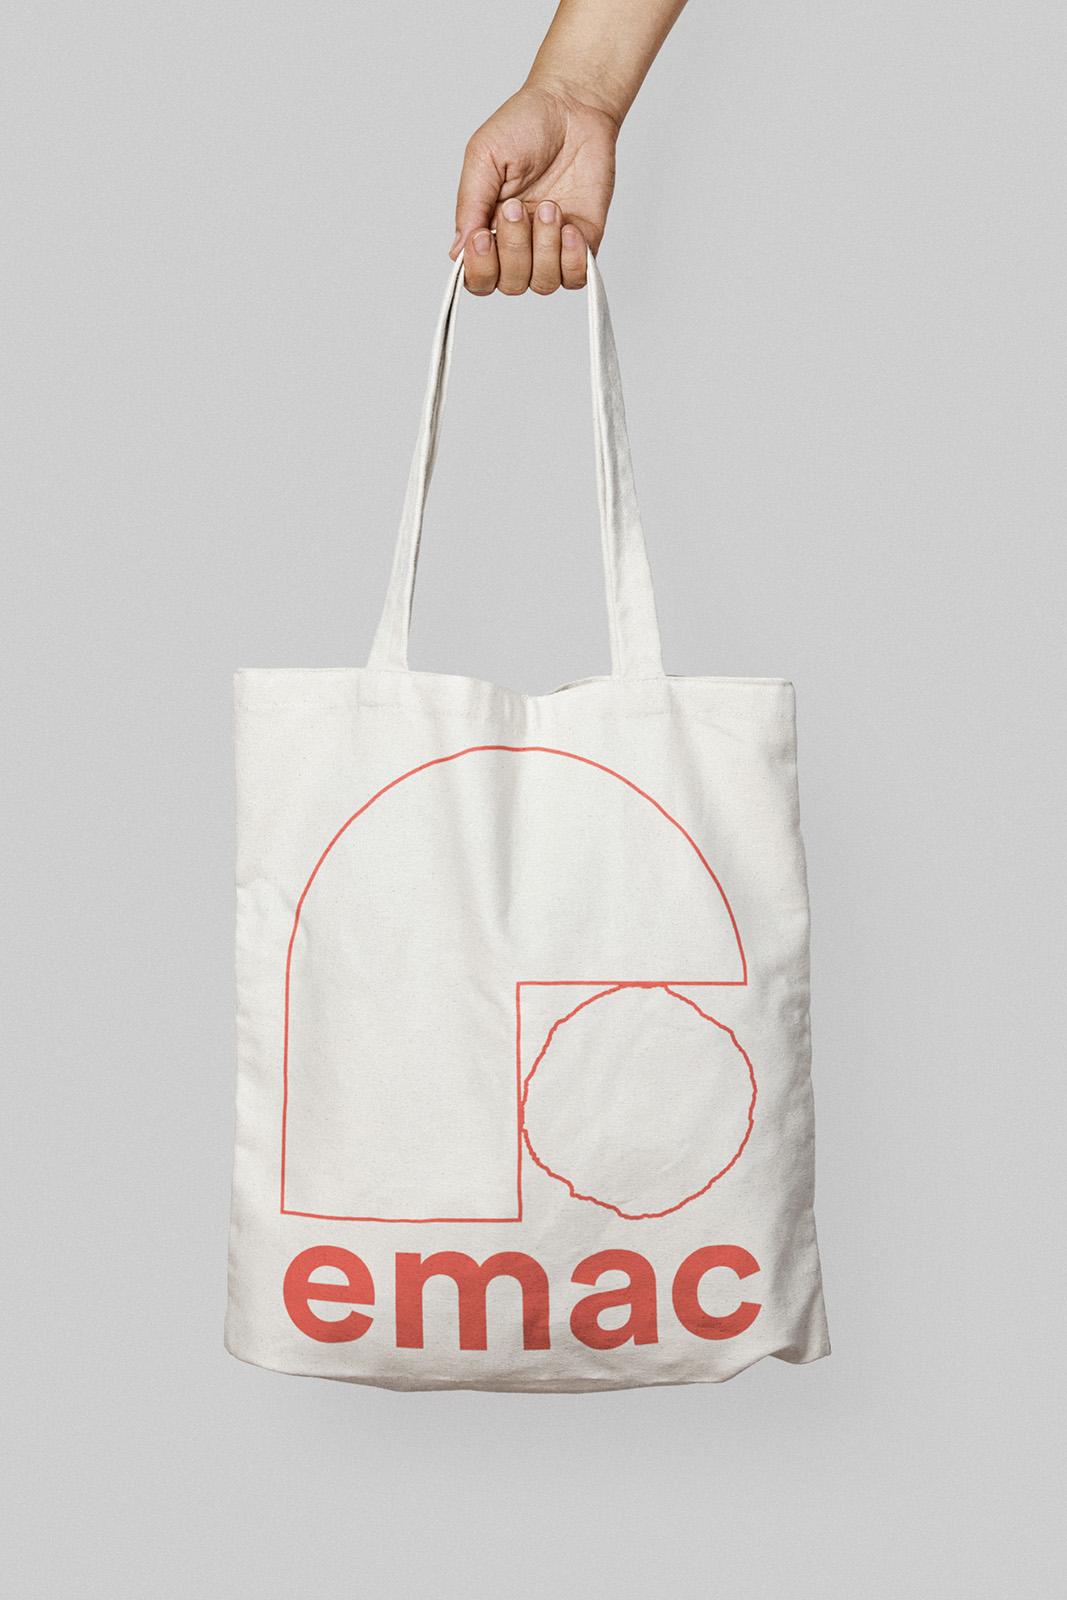 Festival Emac - Identidad visual y print